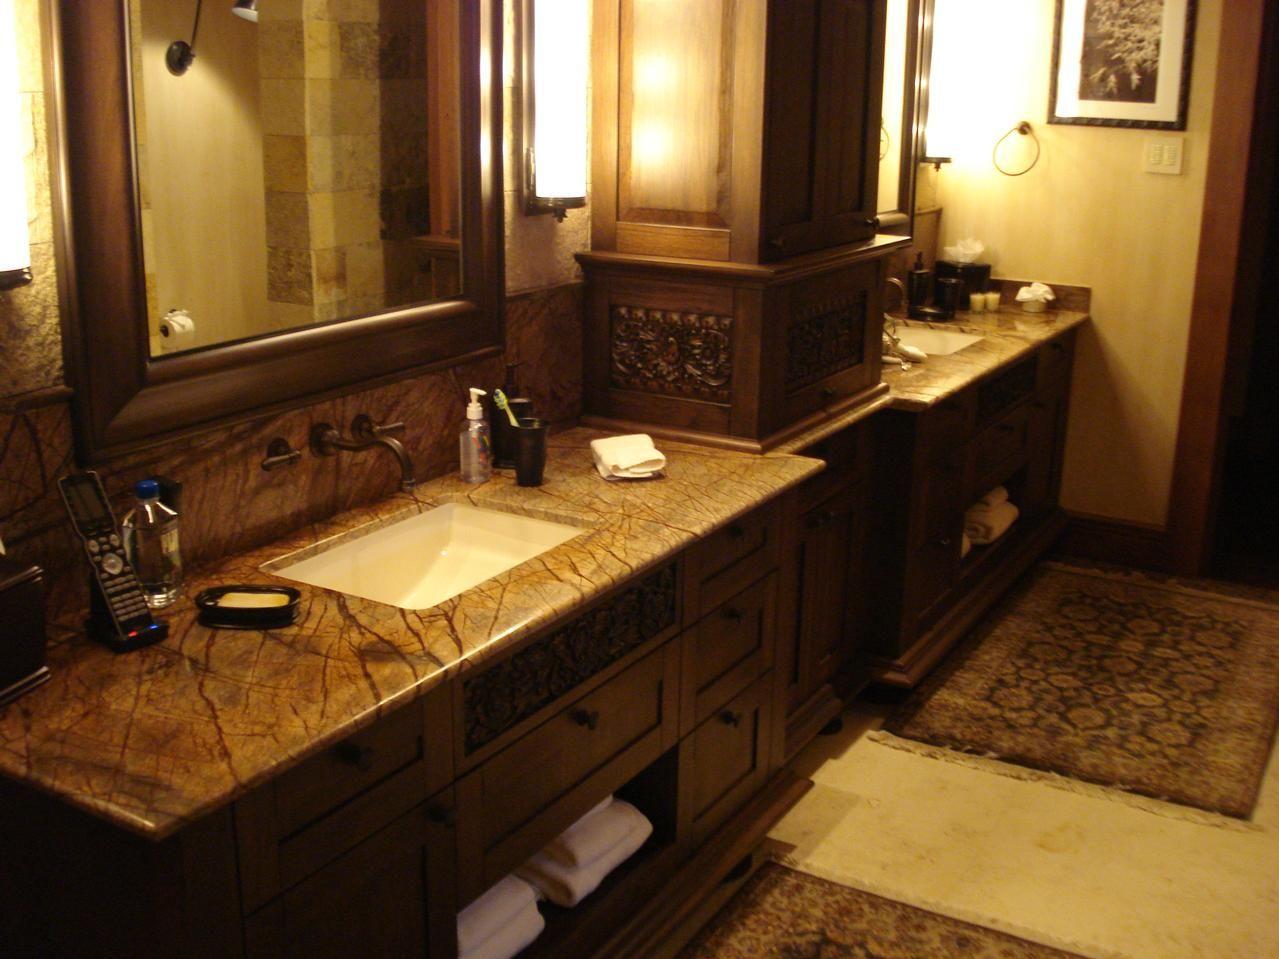 marble bathroom countertops. Countertops · Marble Bathroom